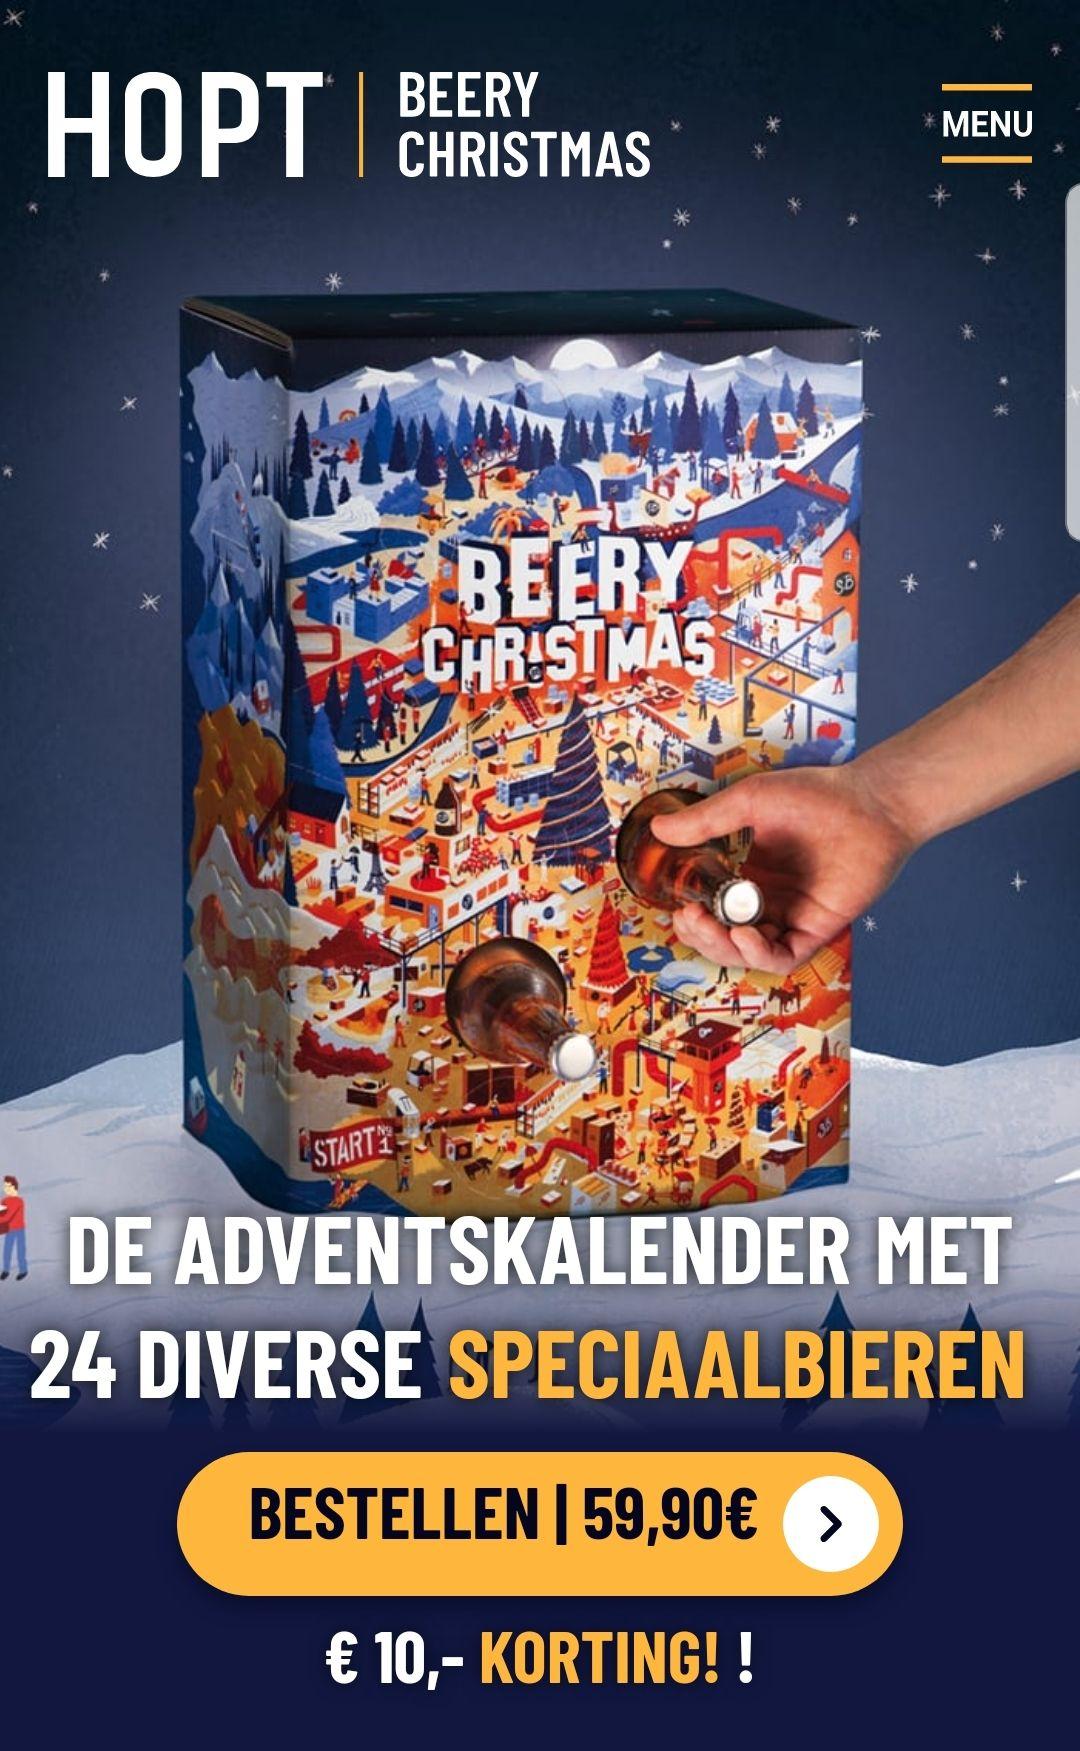 20 euro korting op bier adventkalender @ hopt.nl!